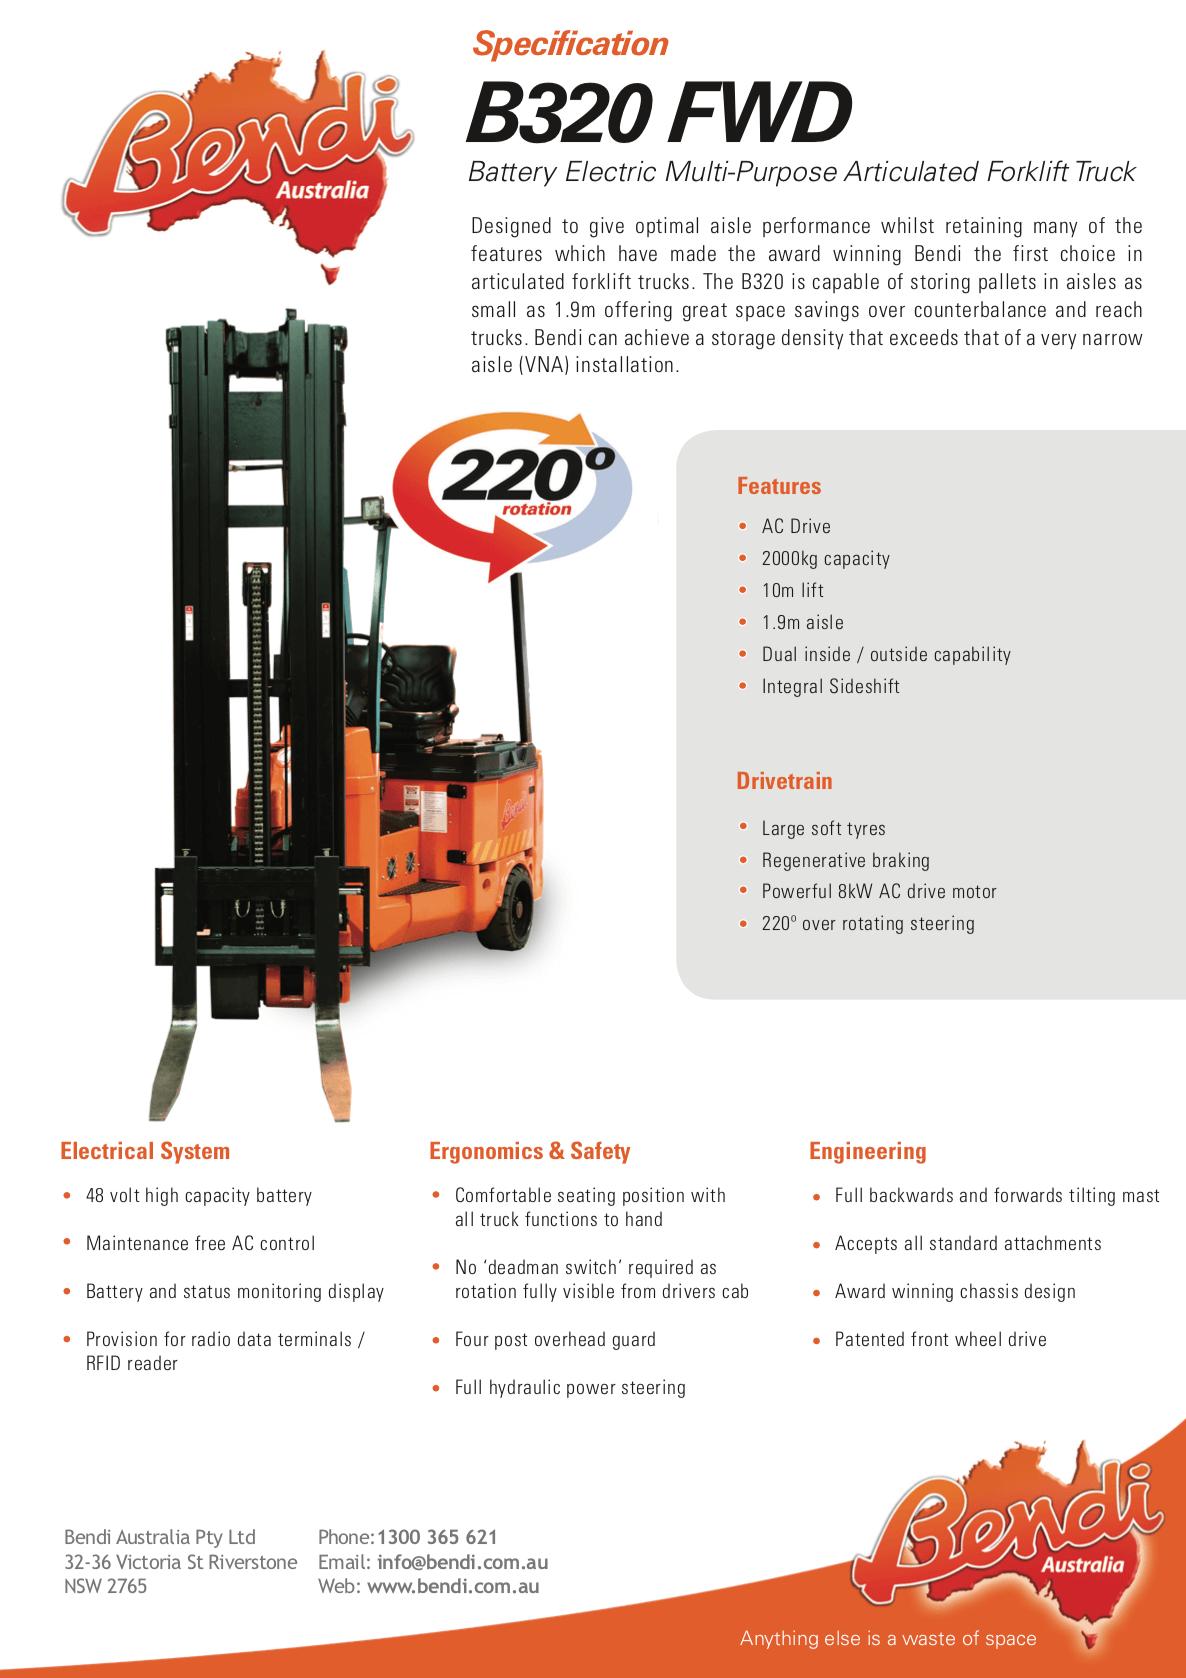 B320 FWD Forklift